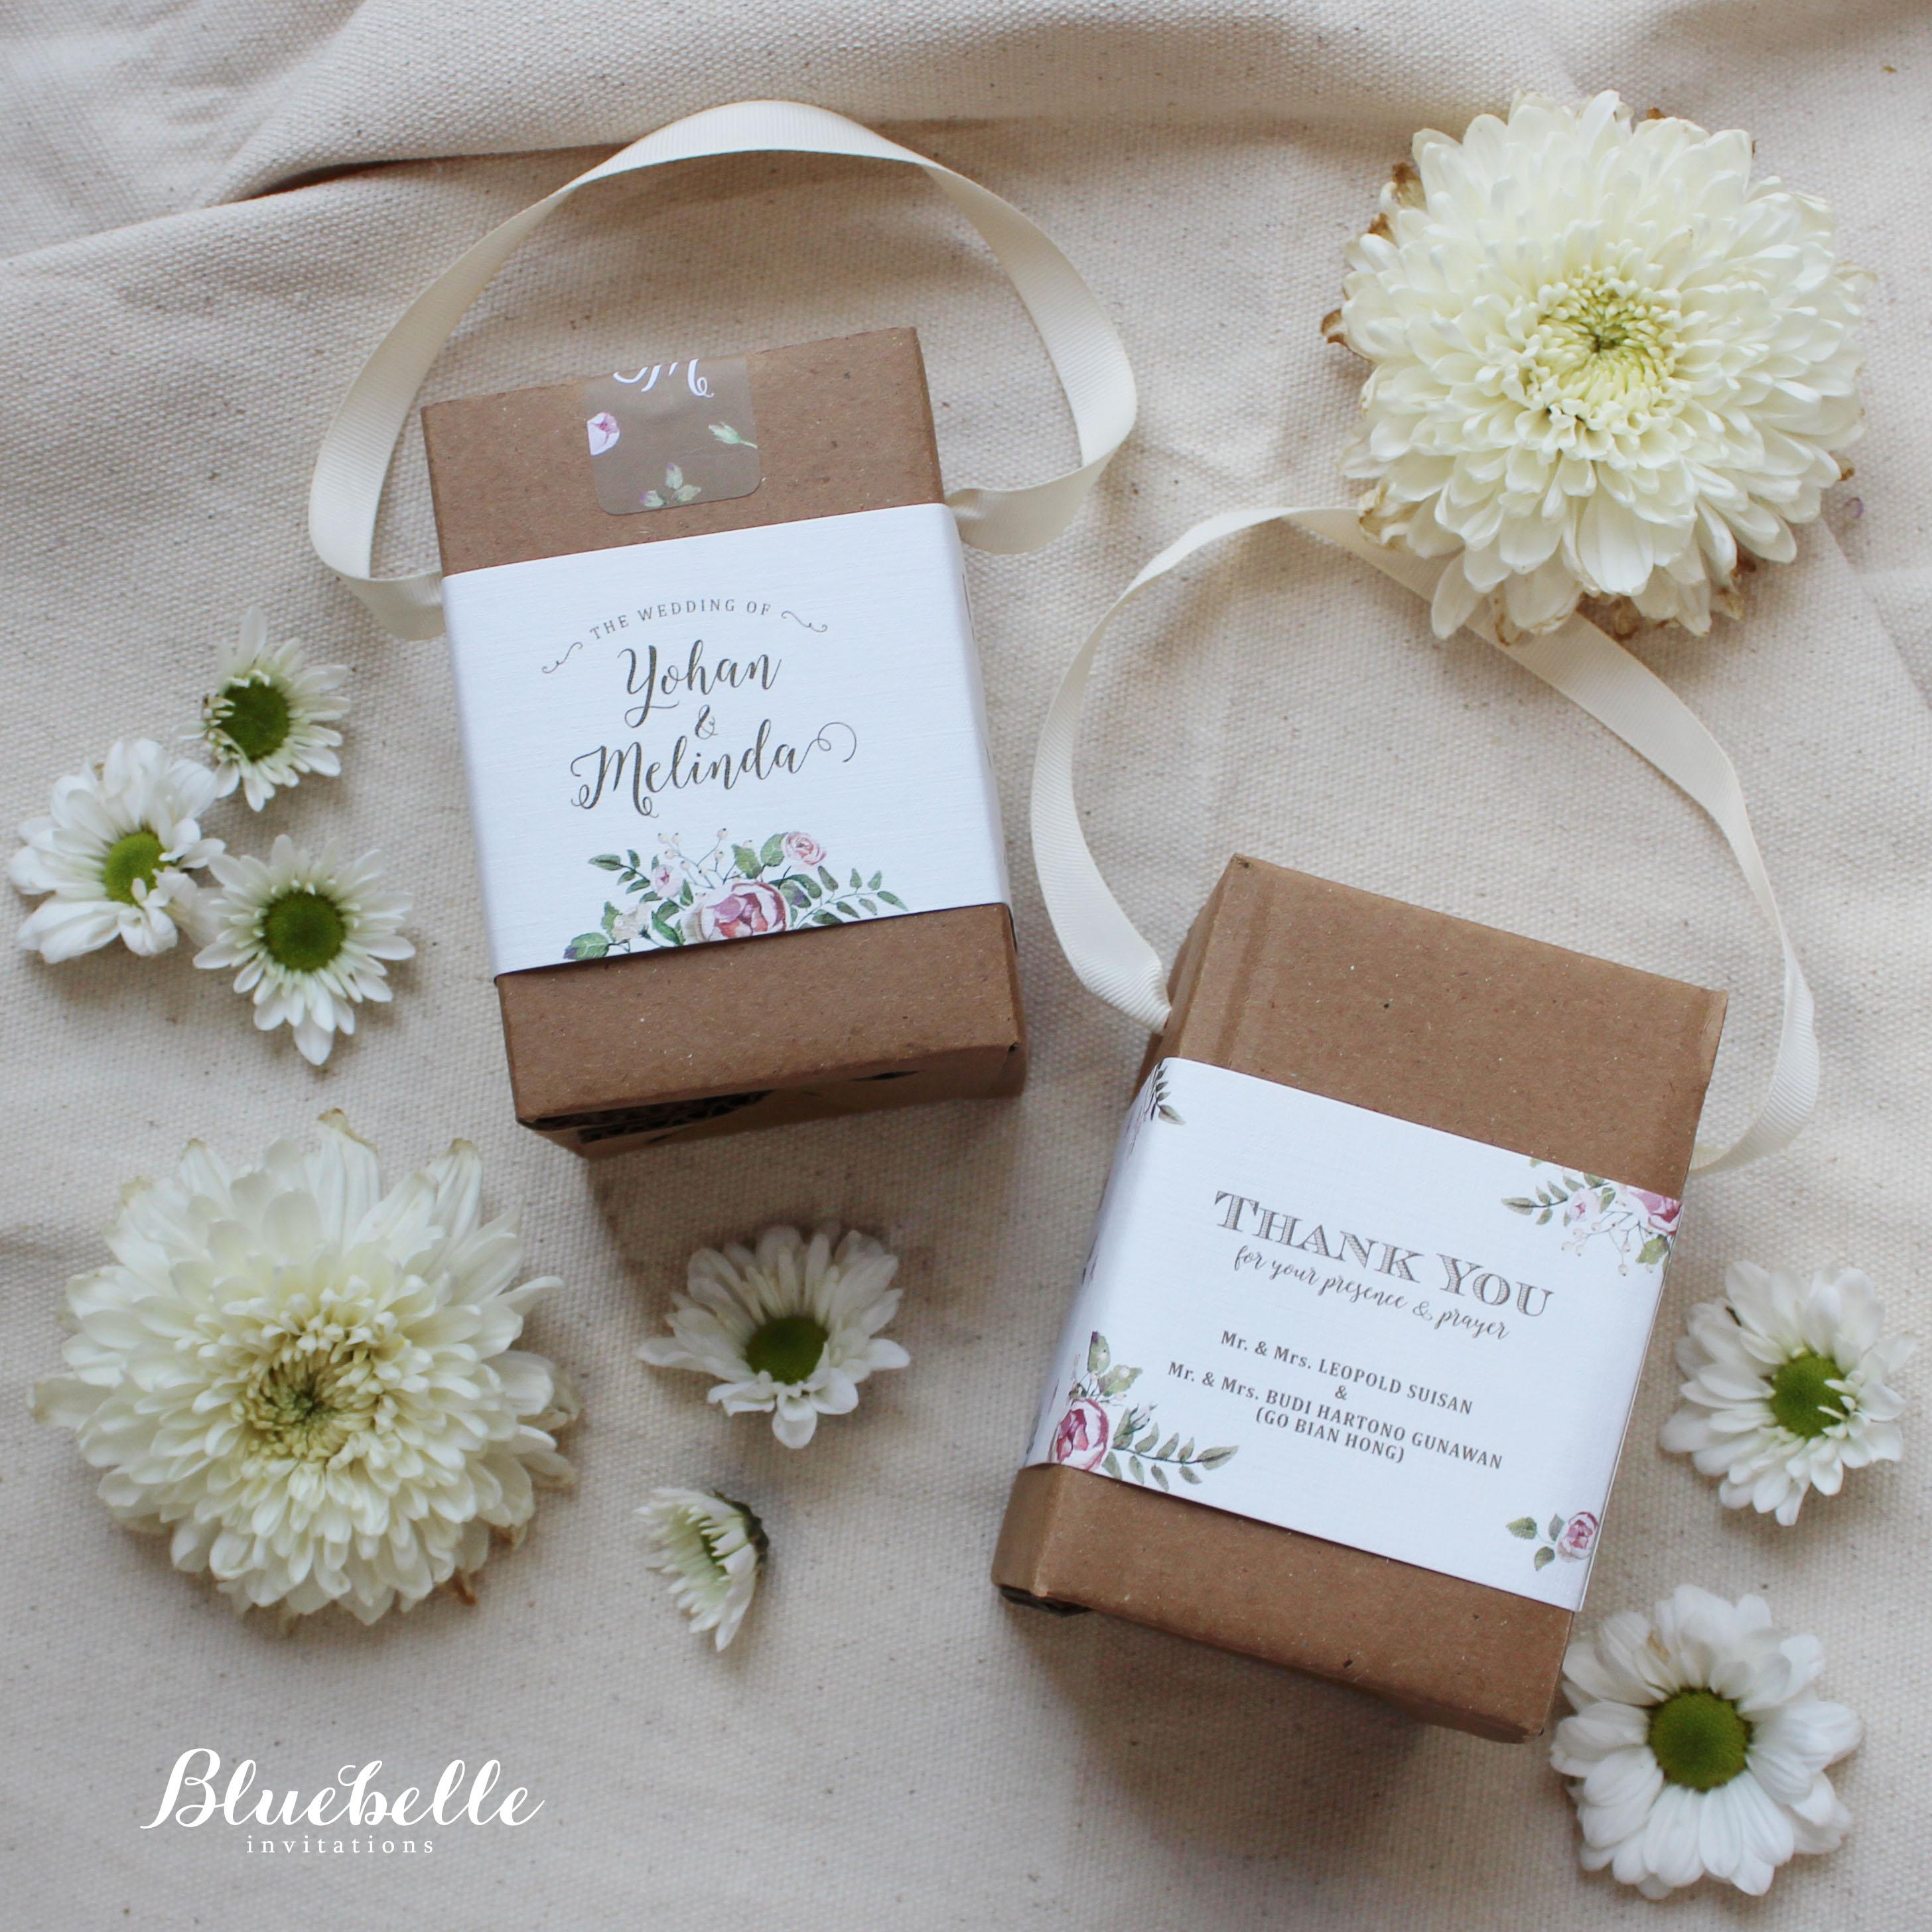 Yohan Melinda Rustic Pastel Floral Invitation By Bluebelle Houseofcuff Collar Bar Lapel Pin Bros Jas Wedding Best Man Deer Invitations